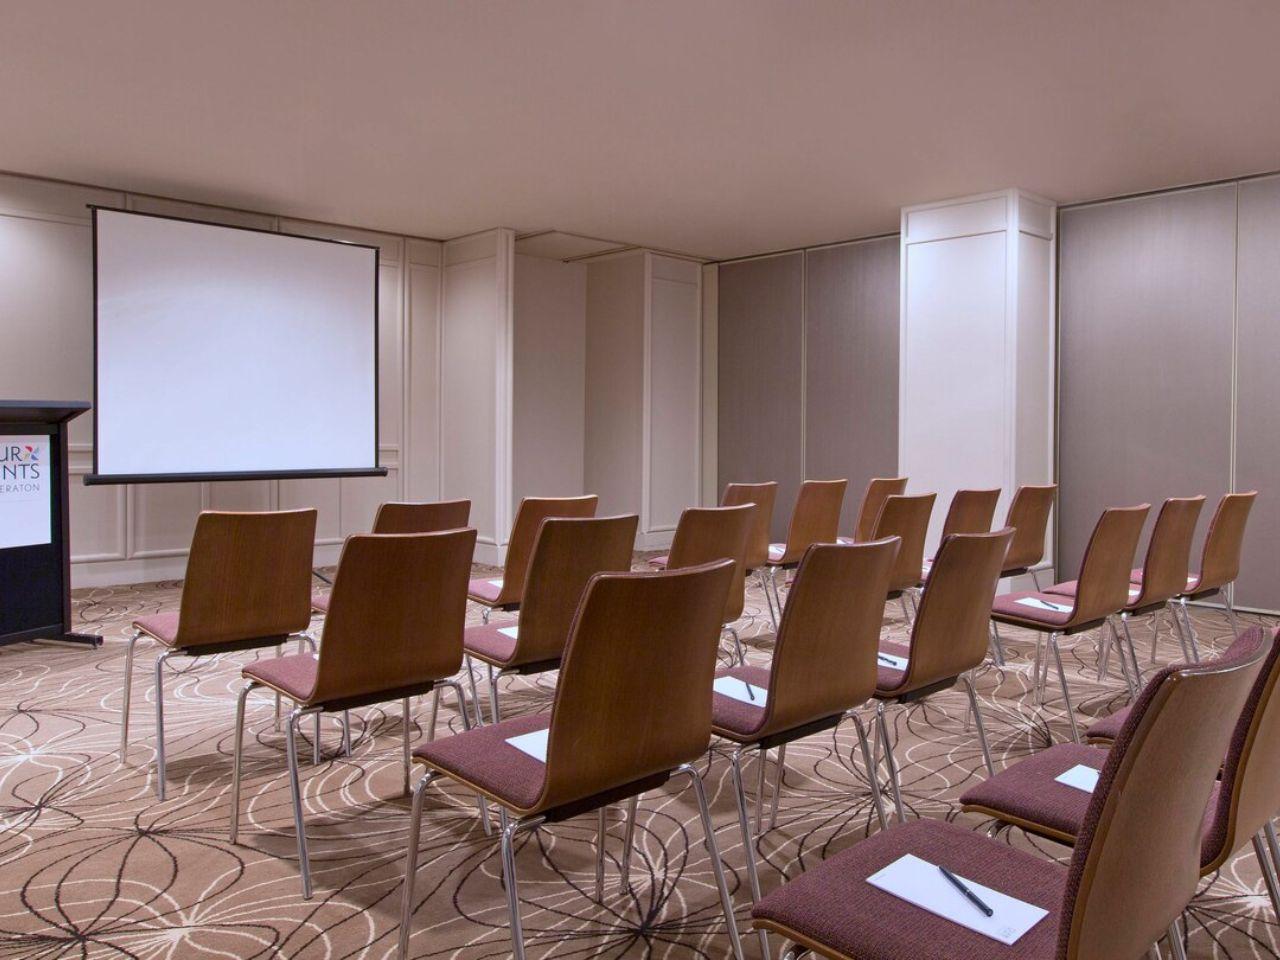 Classroom style meeting room